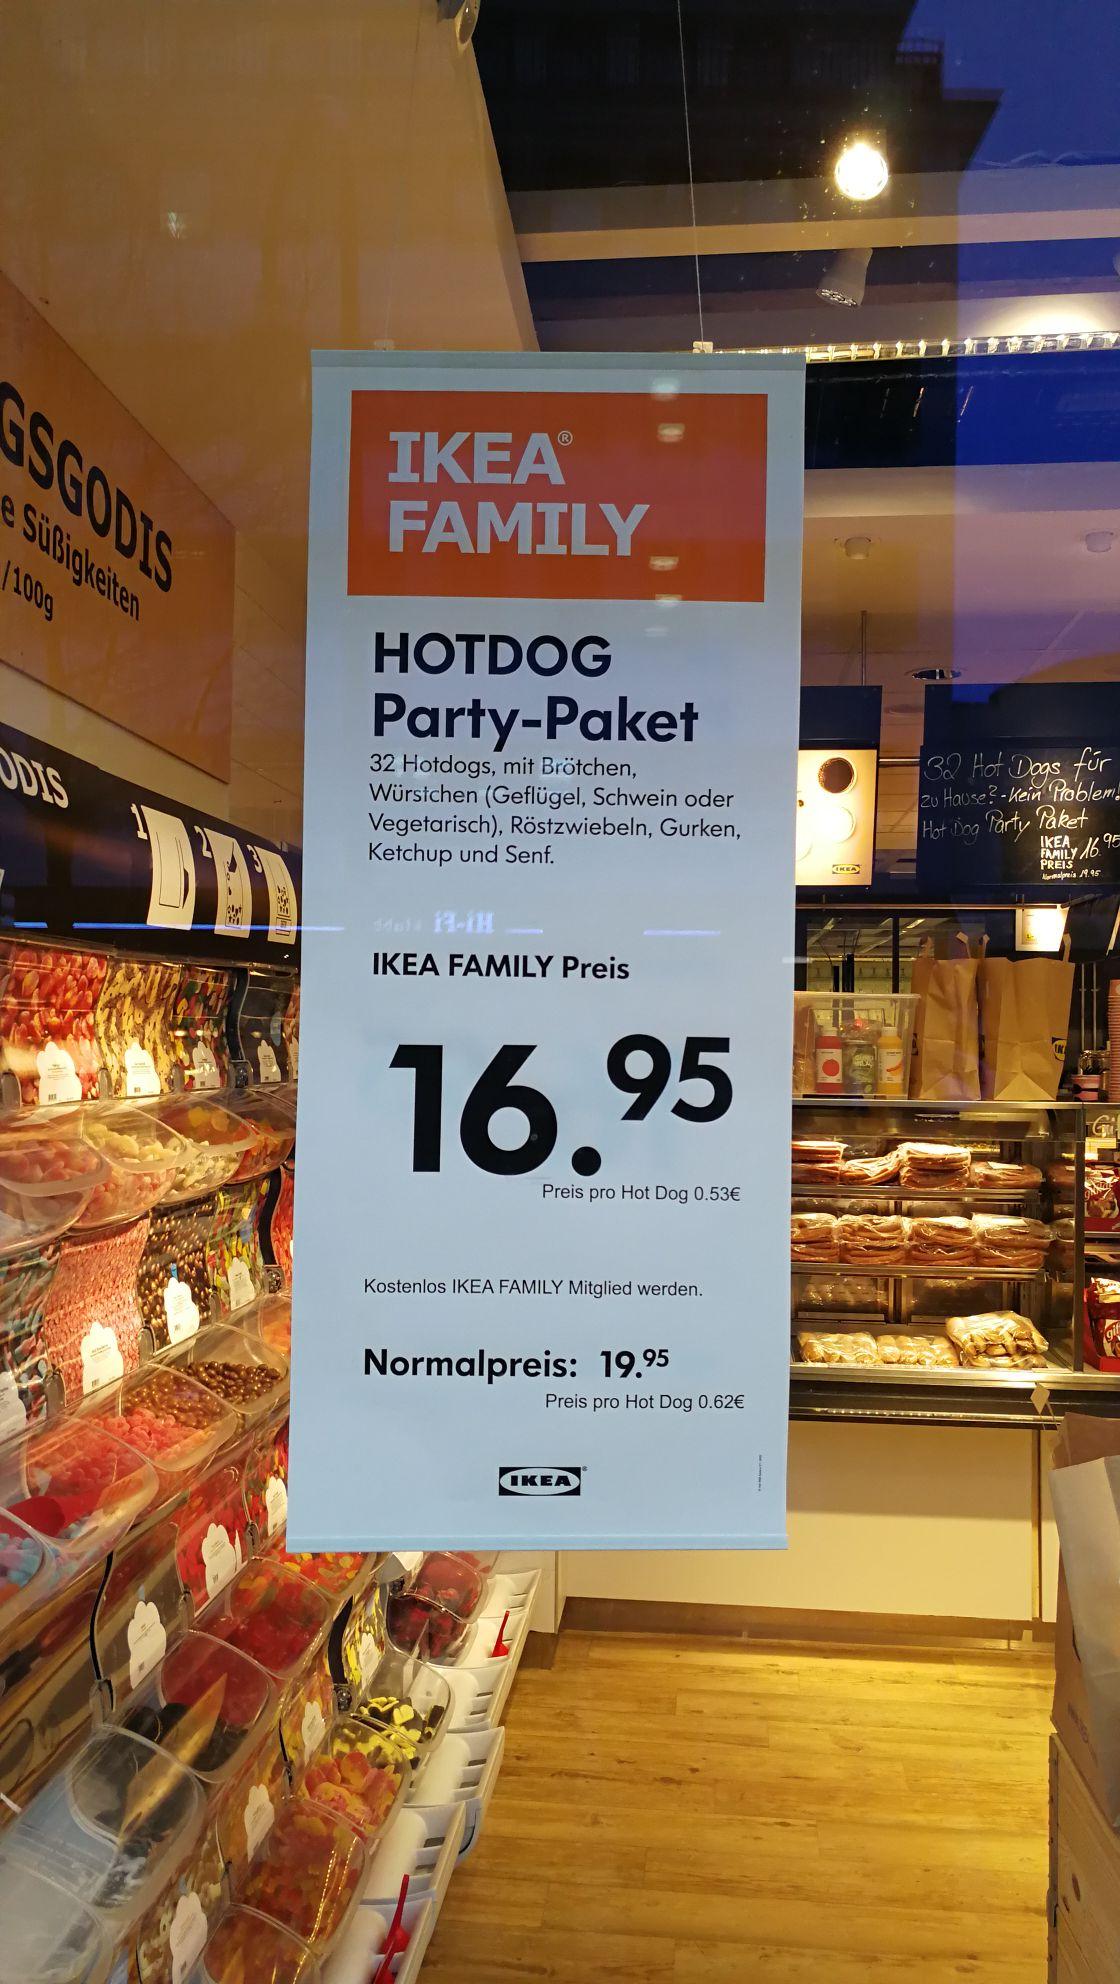 IKEA Hot Dog Paket mit IKEA Family Karte (Hamburg Altona)